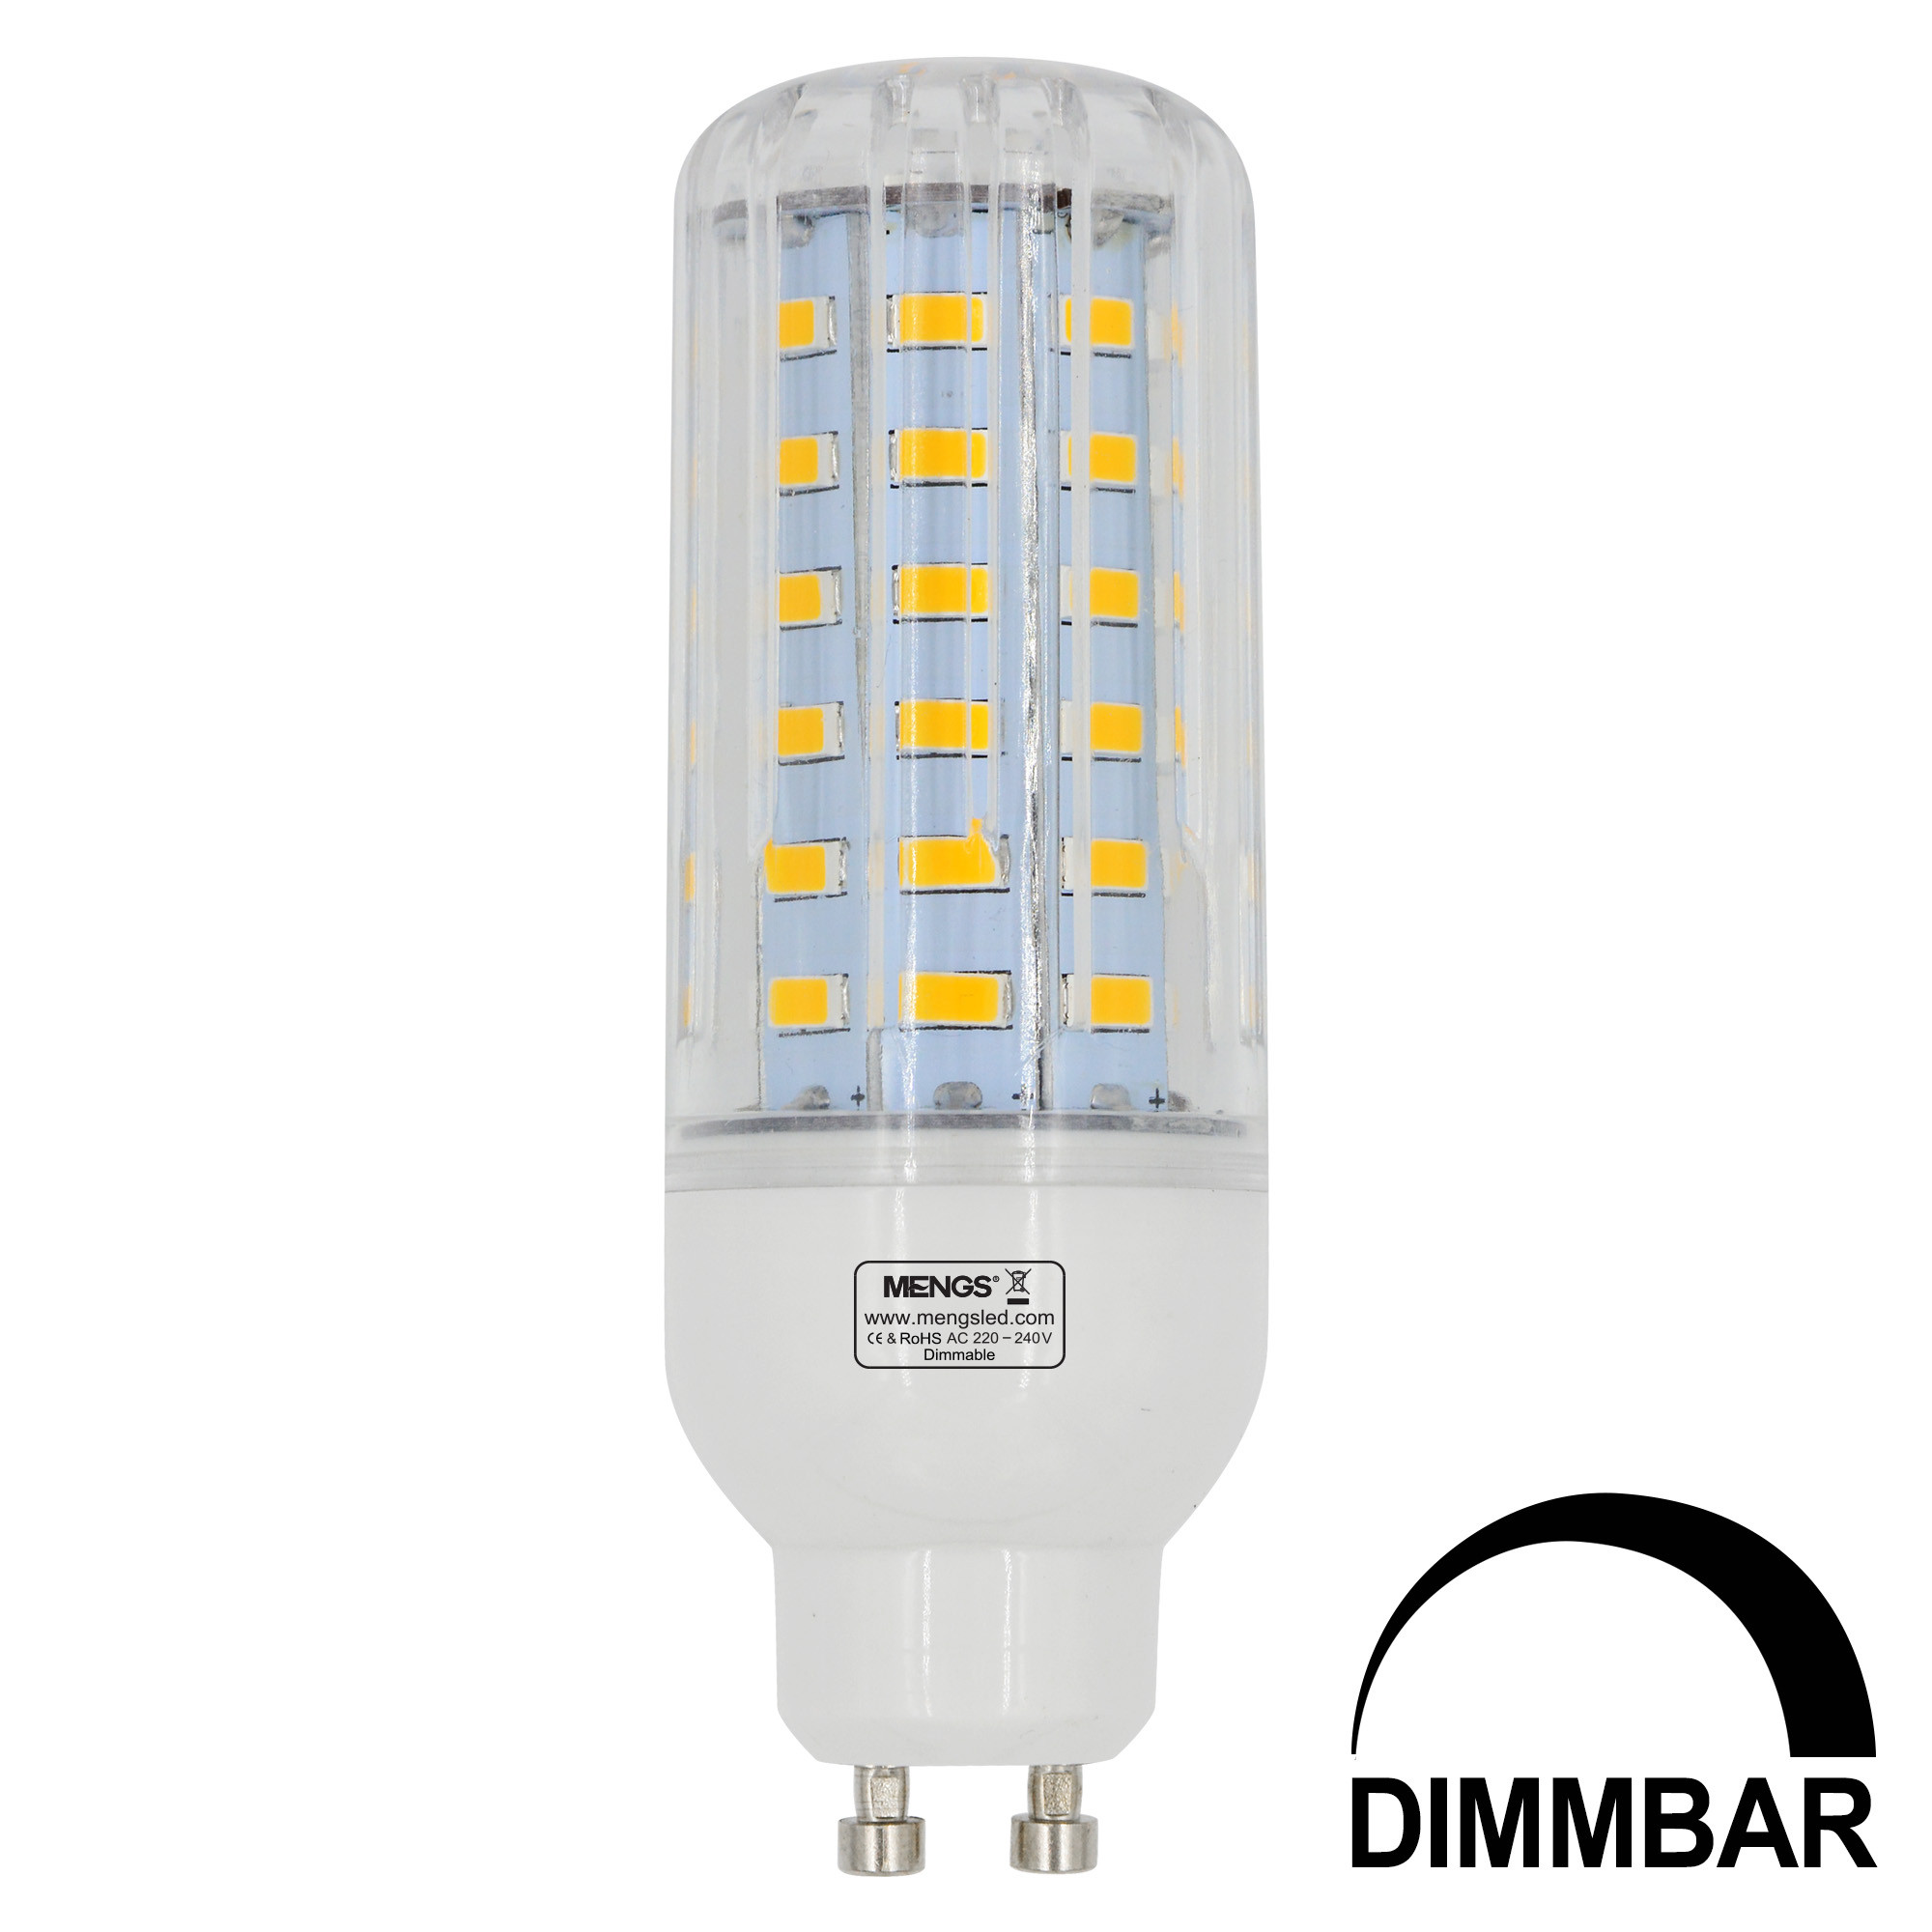 MENGS® GU10 9W LED Dimmable Corn Light 60x 5736 SMD LED Bulb Lamp AC 220-240V In Warm White Energy-Saving Light